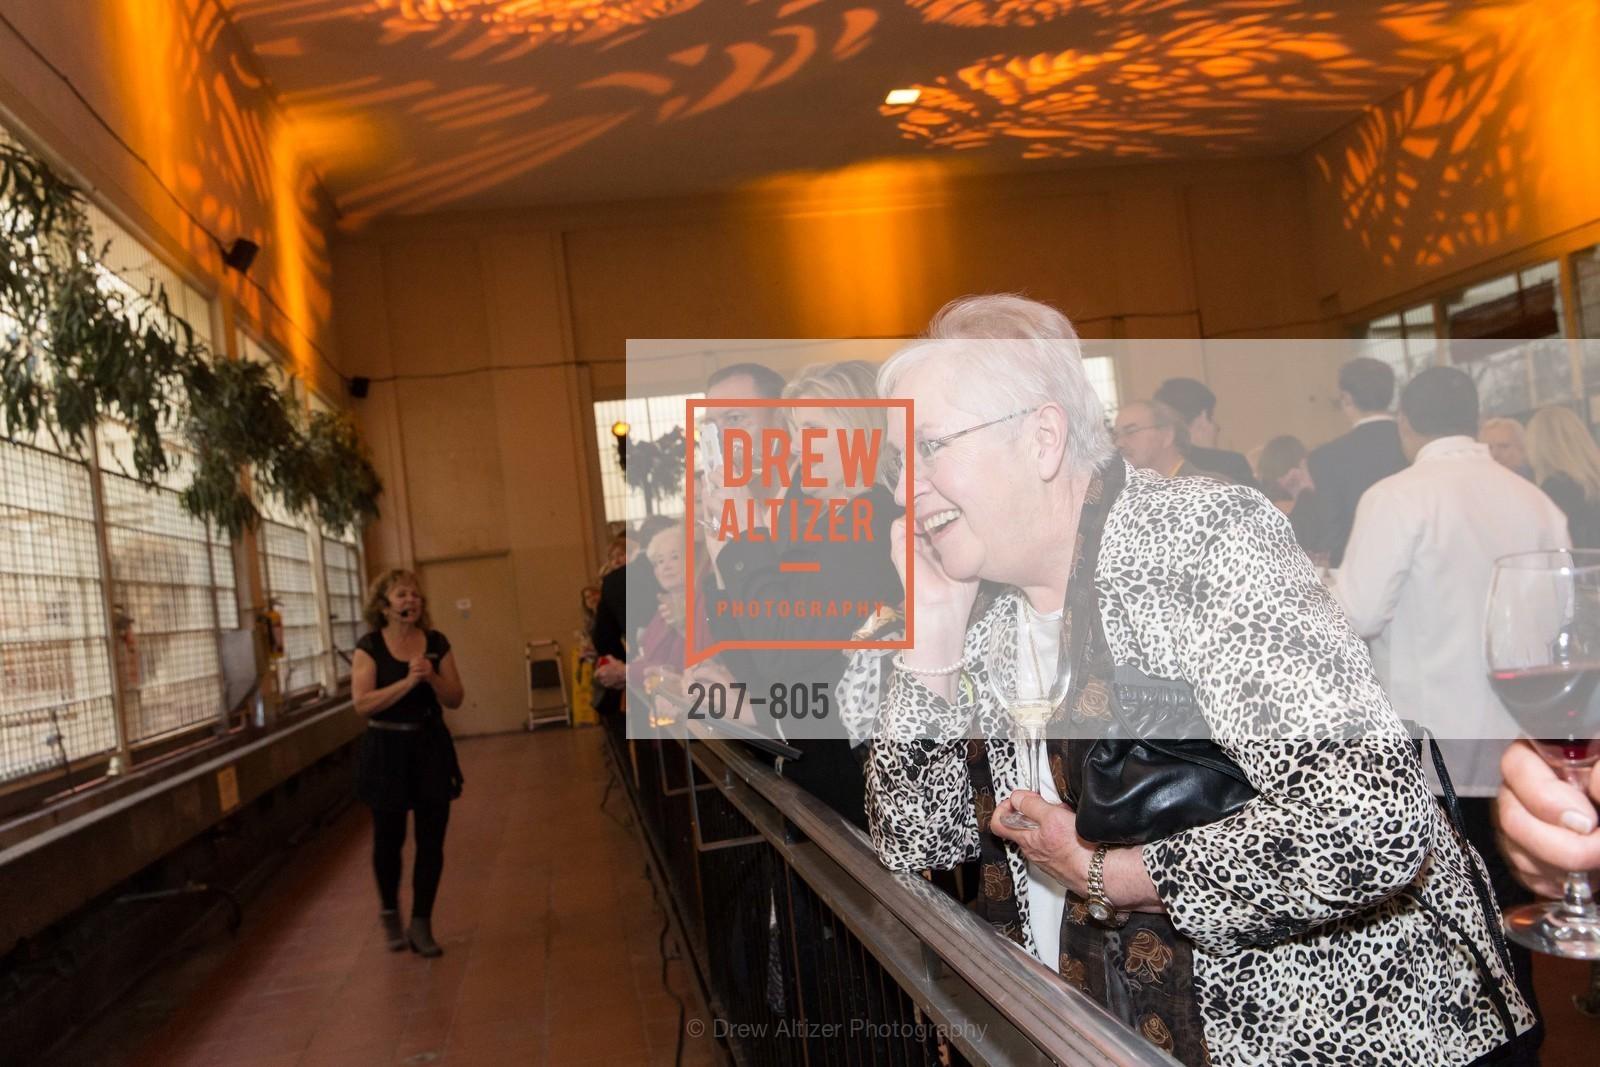 Extras, ZOOFEST 2015, April 25th, 2015, Photo,Drew Altizer, Drew Altizer Photography, full-service agency, private events, San Francisco photographer, photographer california